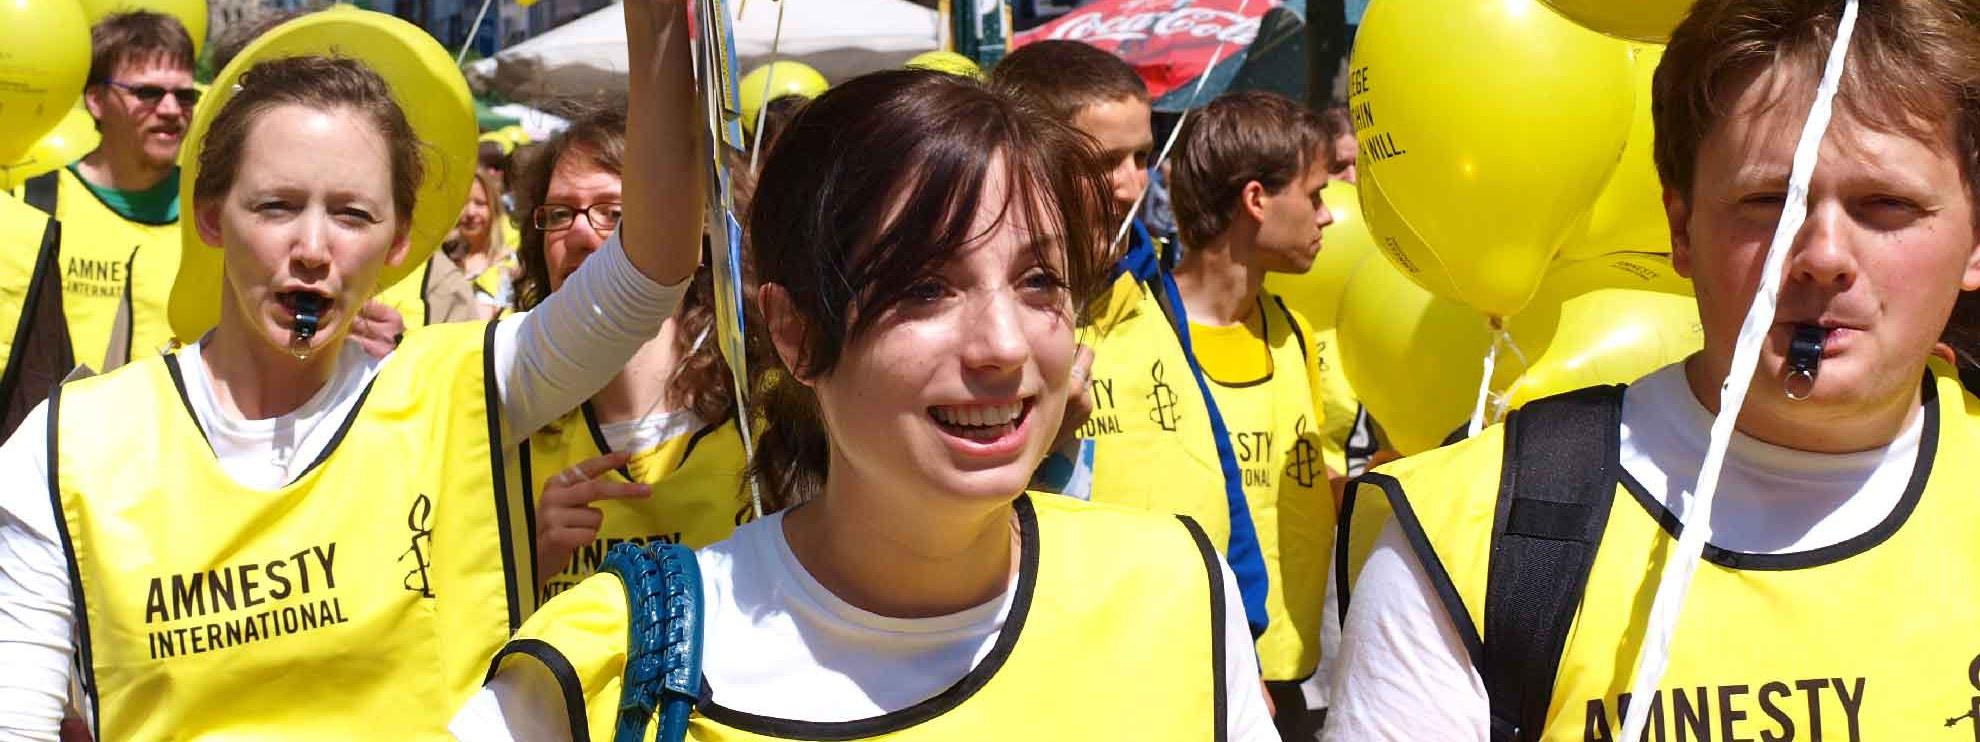 Attivisti di Amnesty International manifestano in piazza © Amnesty International